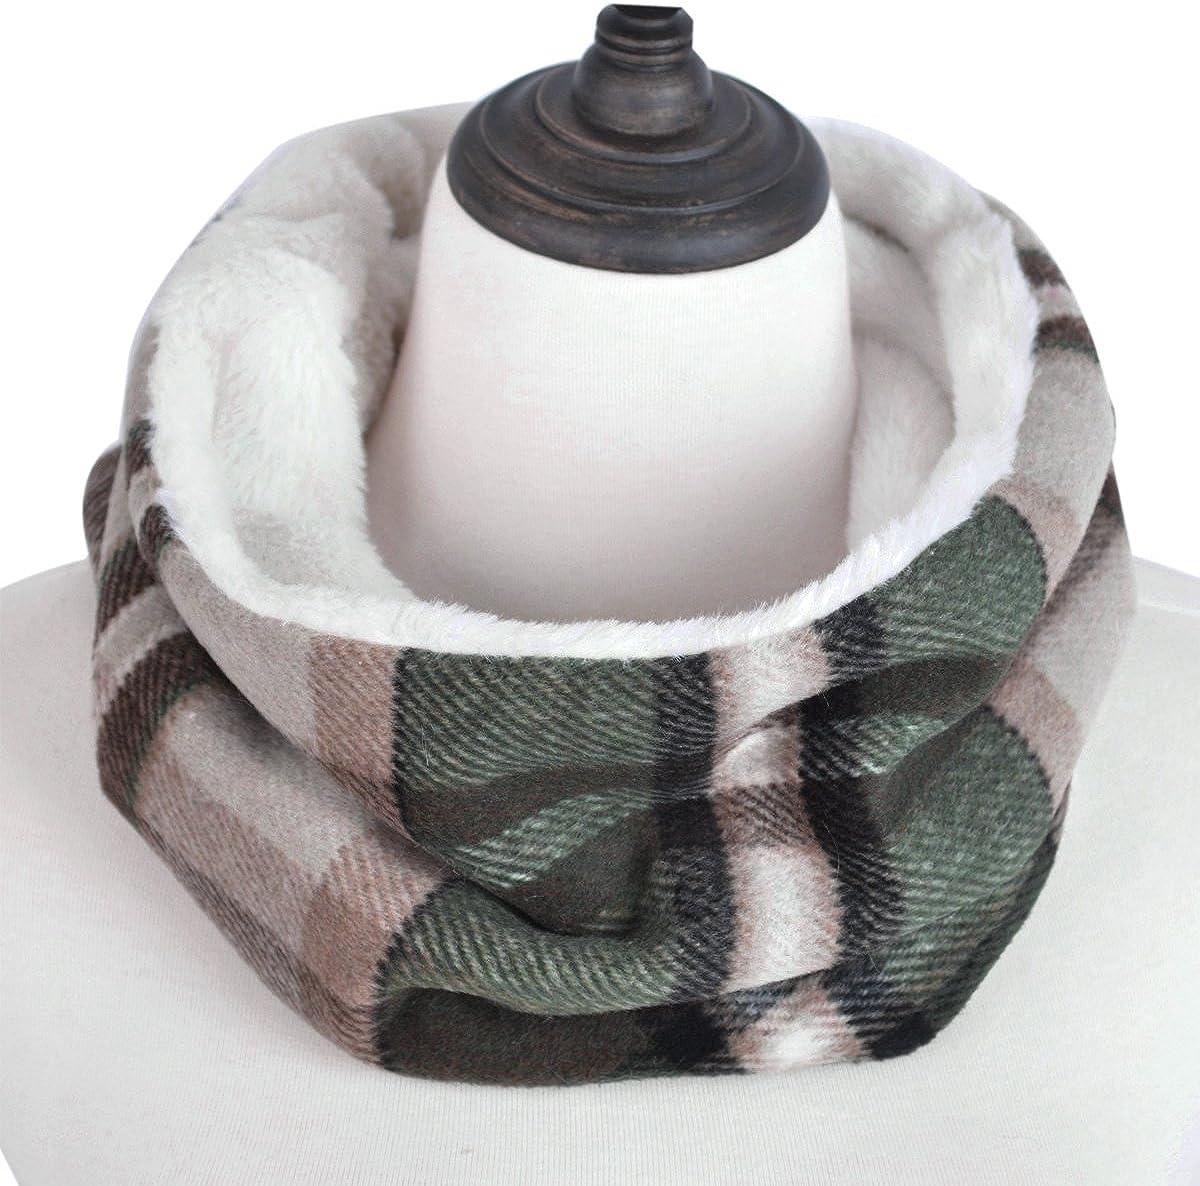 Premium Checker Plaid Soft Faux Fur Infinity Loop Circle Scarf - Diff Colors